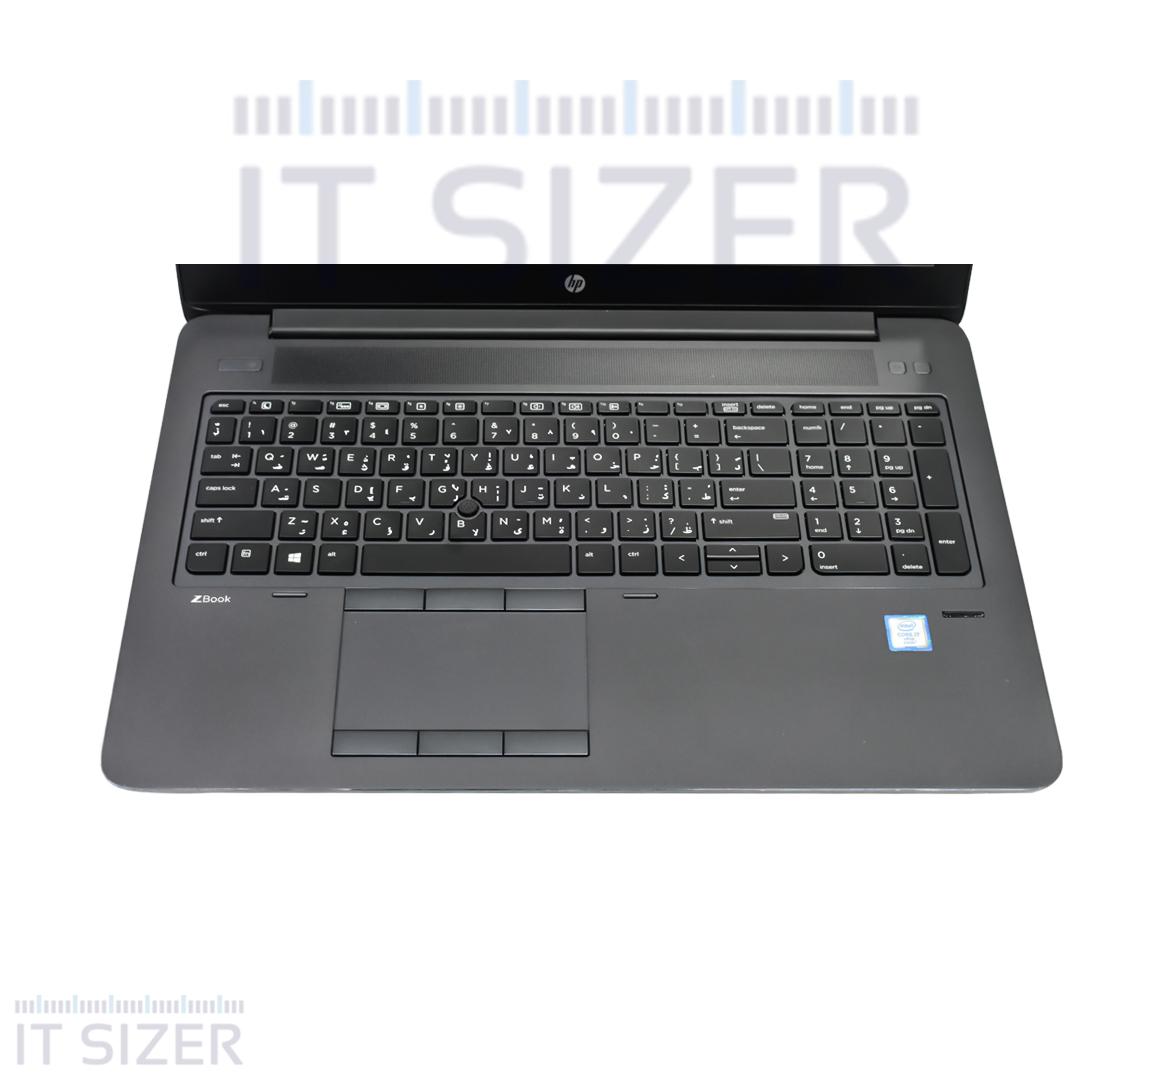 HP ZBook 15 G3 Business Laptop, Intel Core i7 CPU, 16GB DDR4 SODIMM RAM, 512GB SSD M2, 15 inch Display, Windows 10 pro (Renewed)